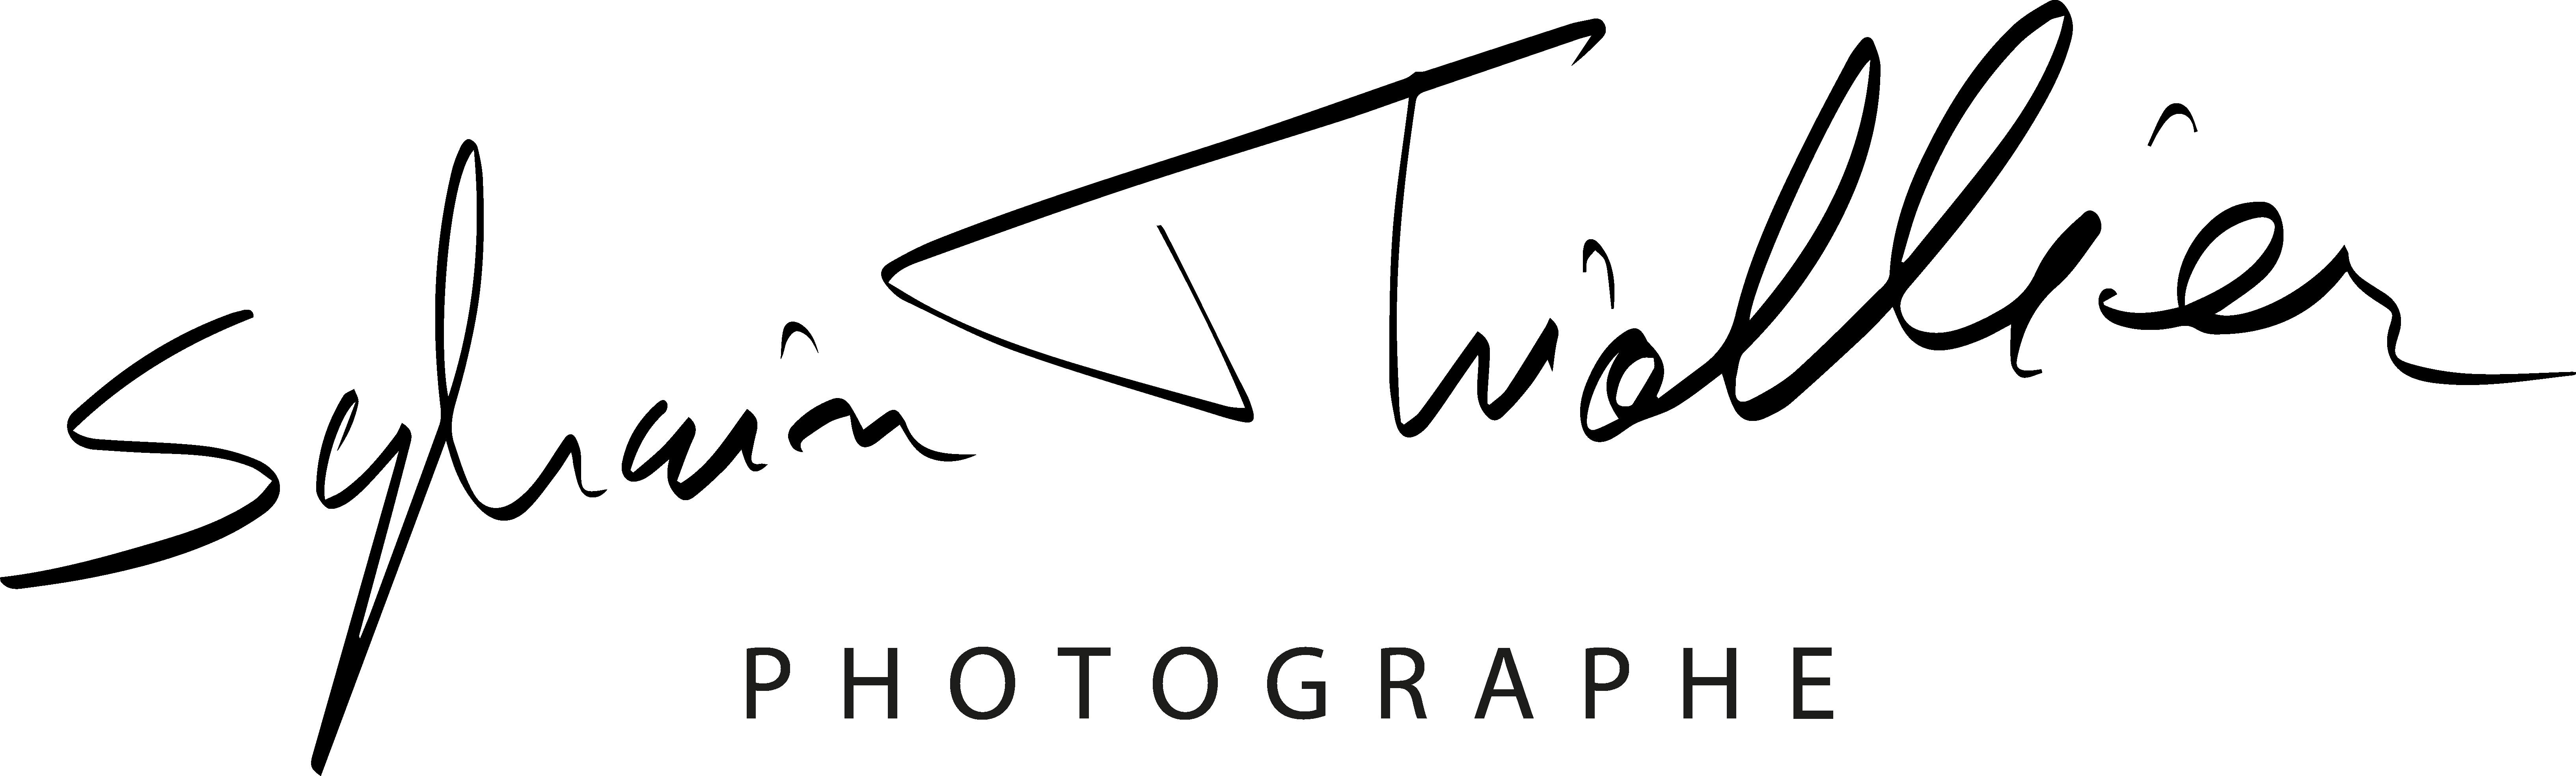 Sylvain Thiollier photographe